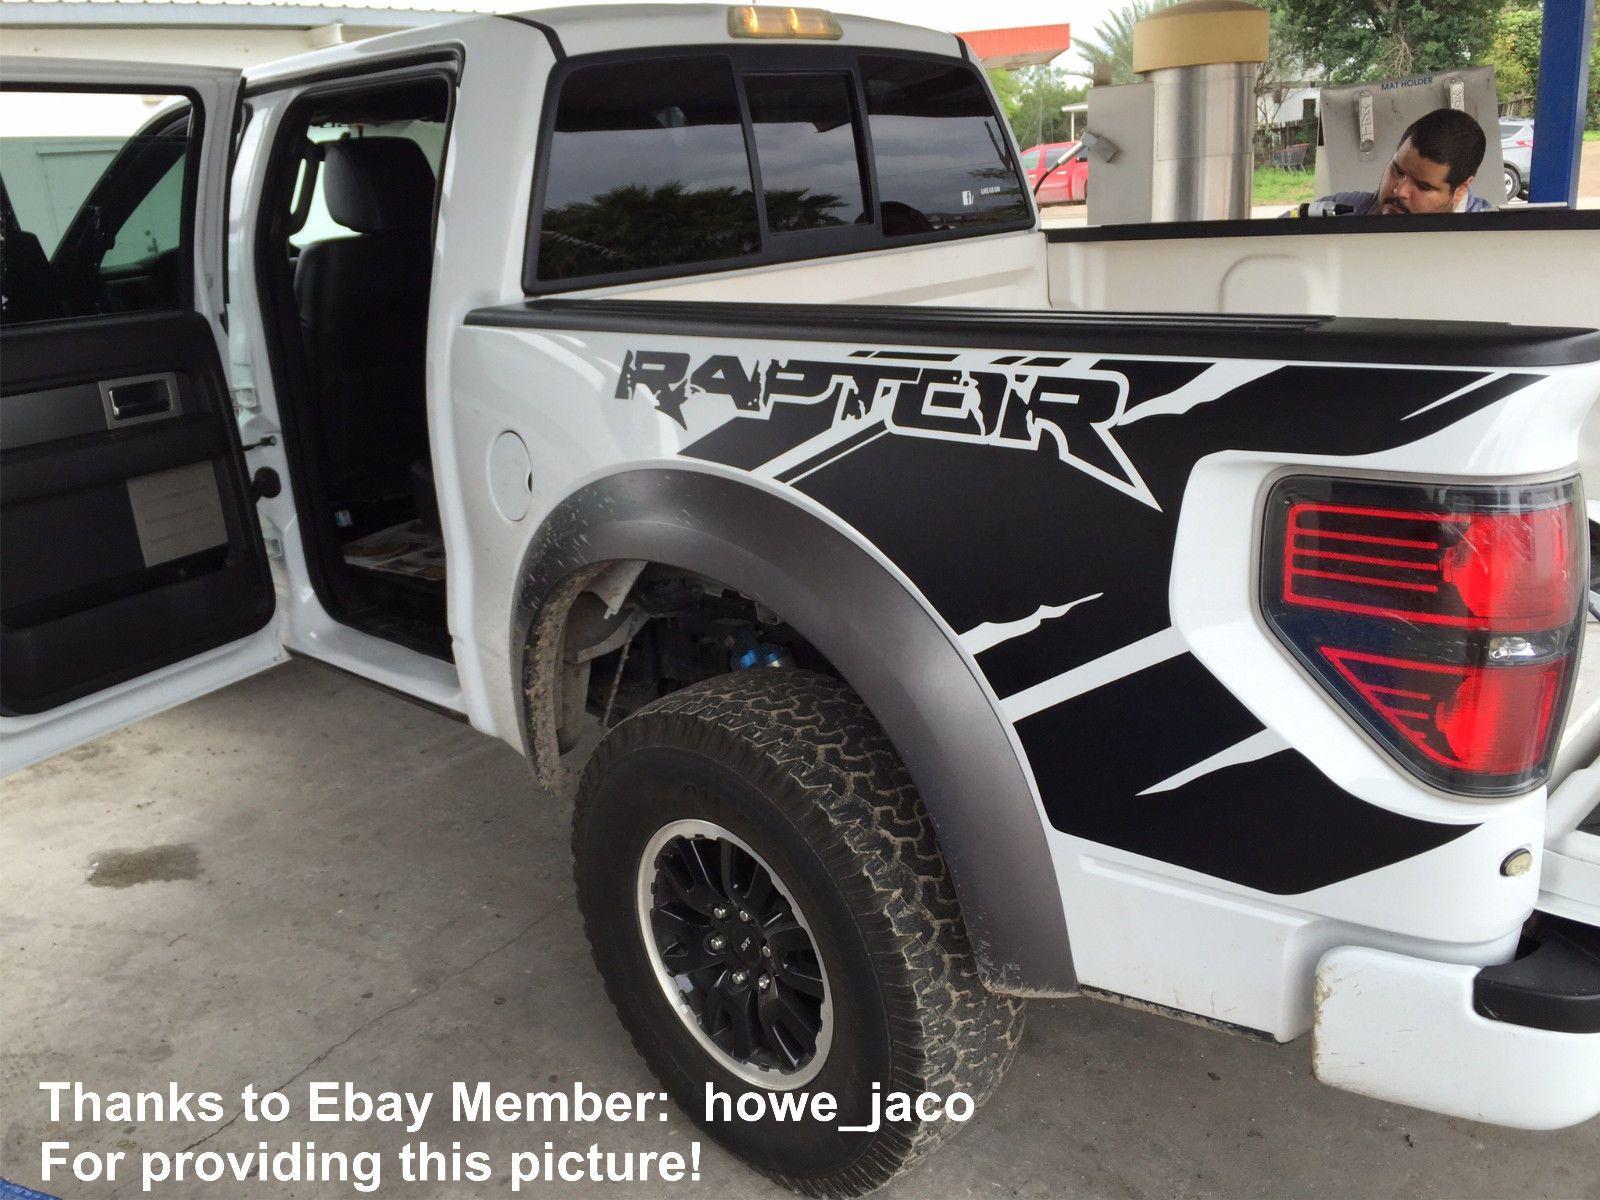 Ford RAPTOR SVT Side Bed Truck Decals Vinyl Graphic Sticker fits 2010-2014